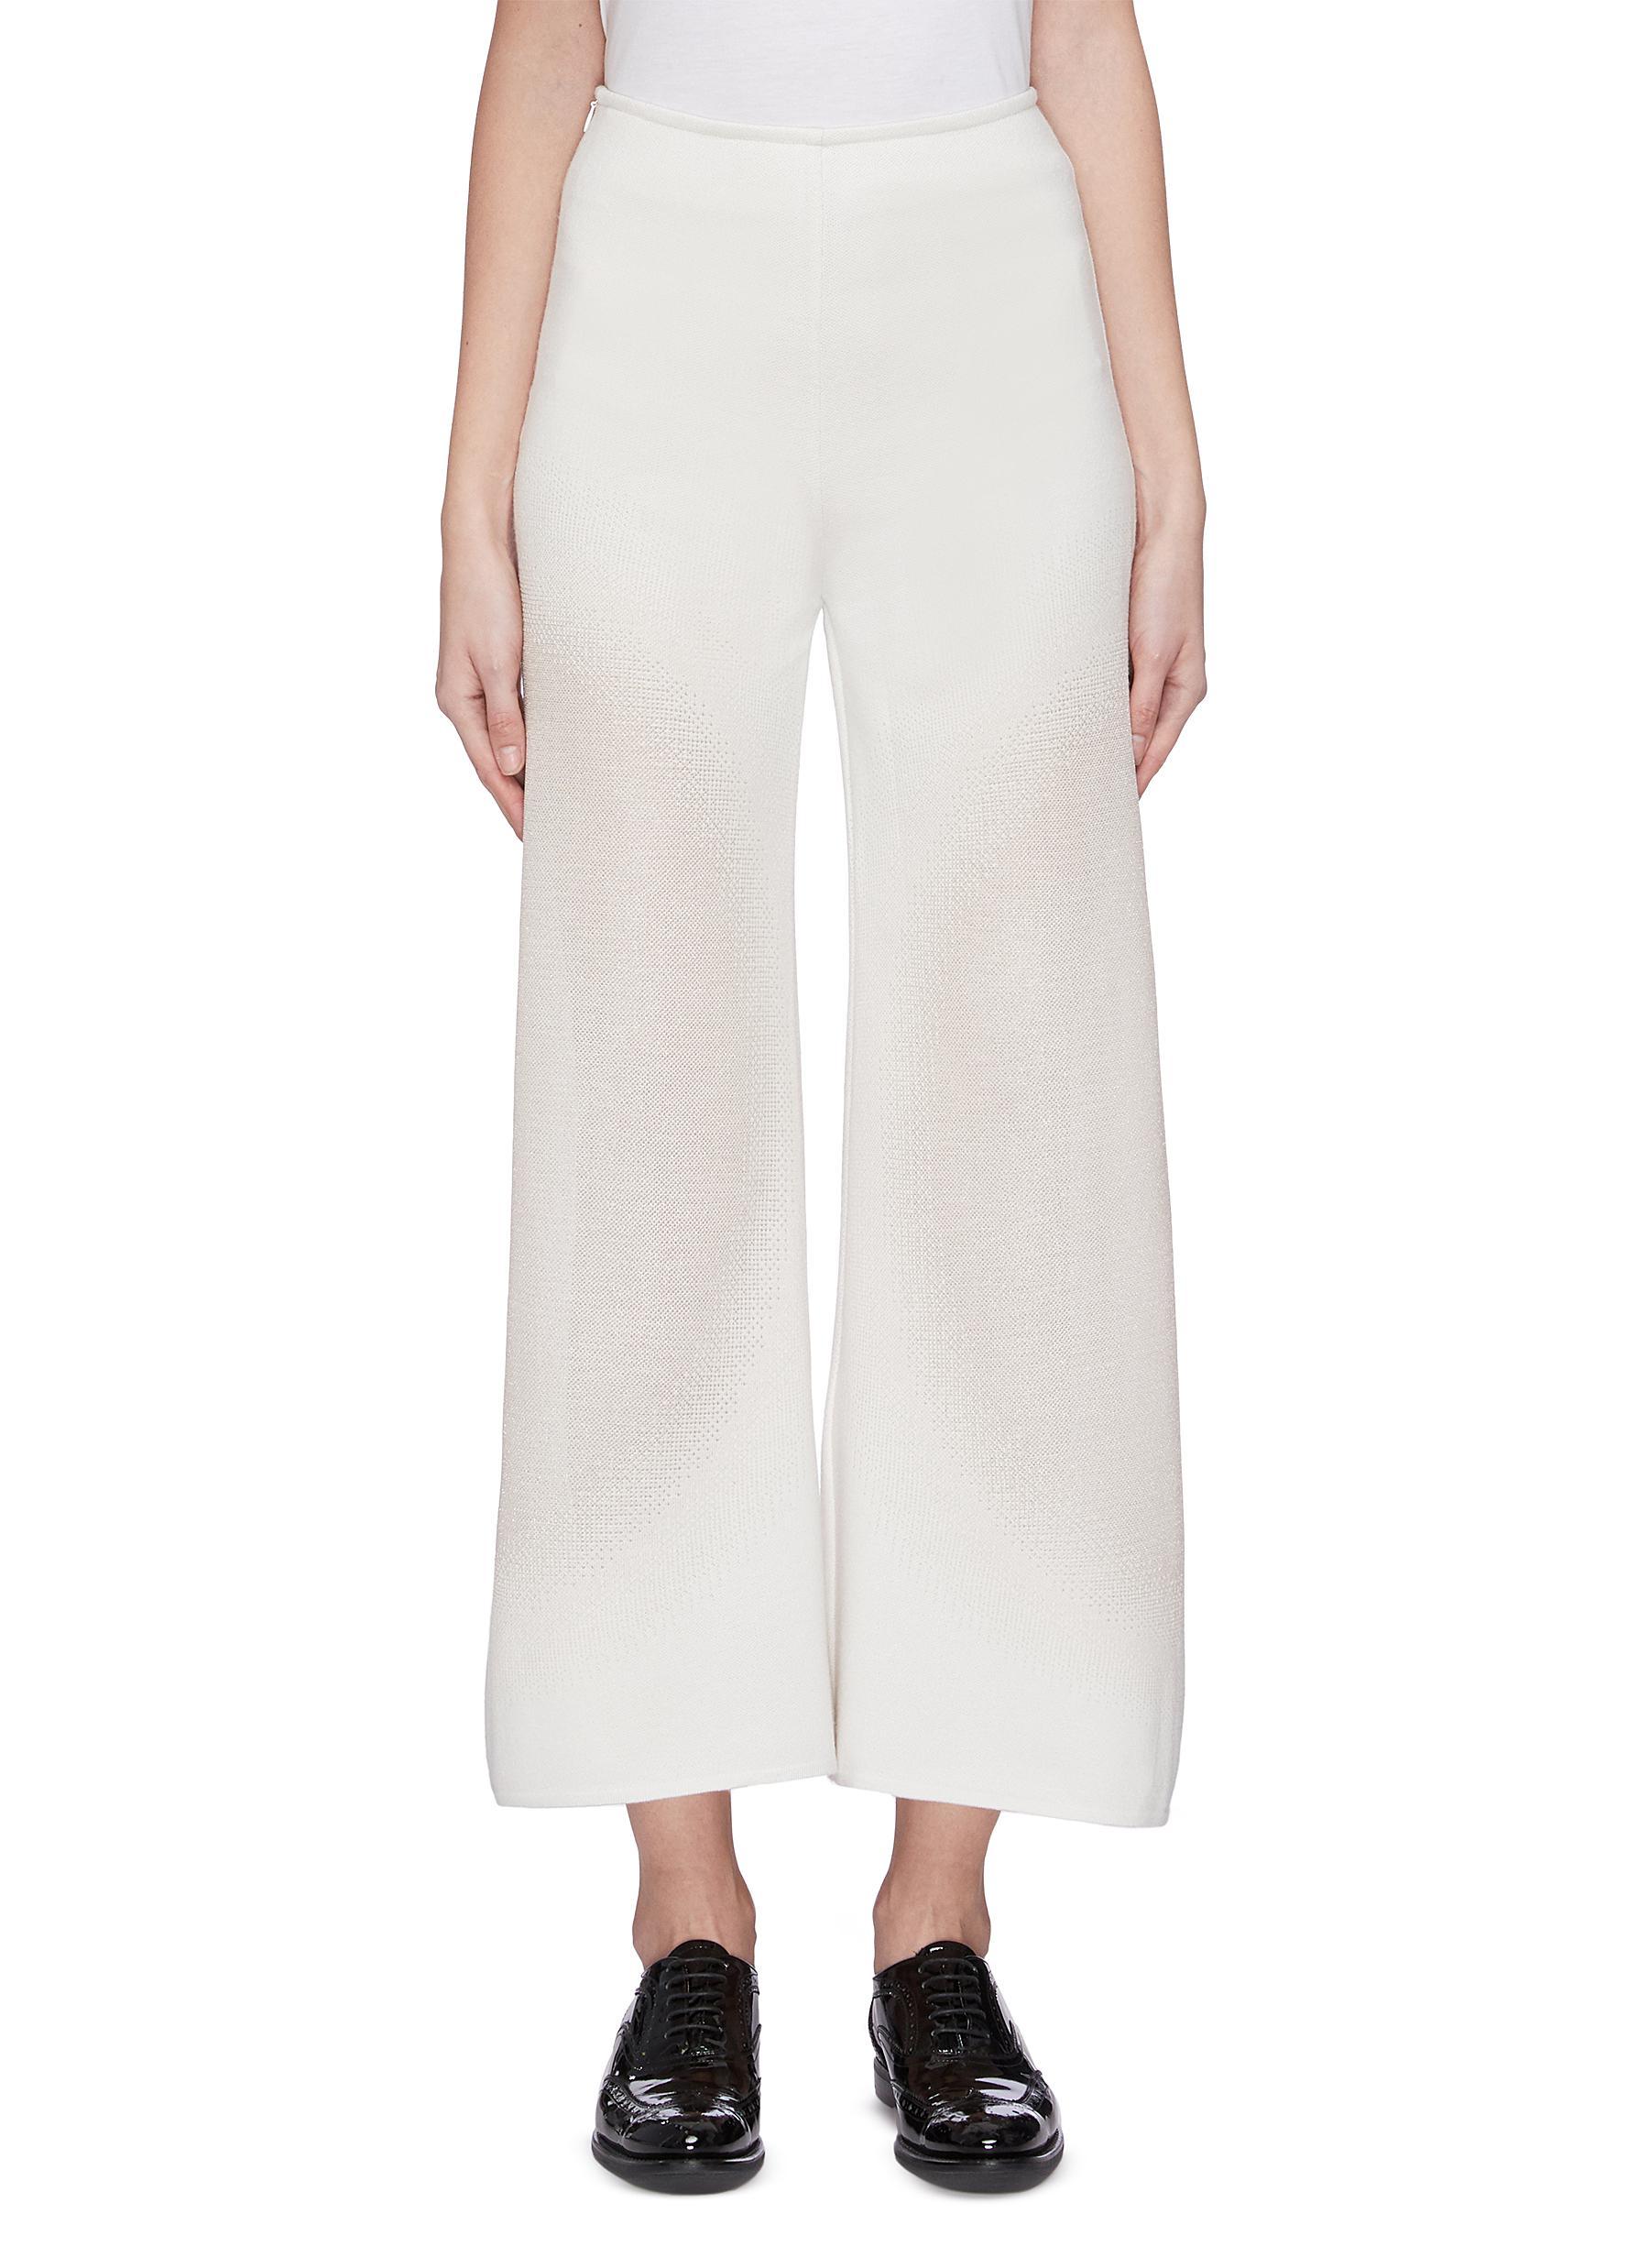 shop Swaying High waist wide leg knit pants online